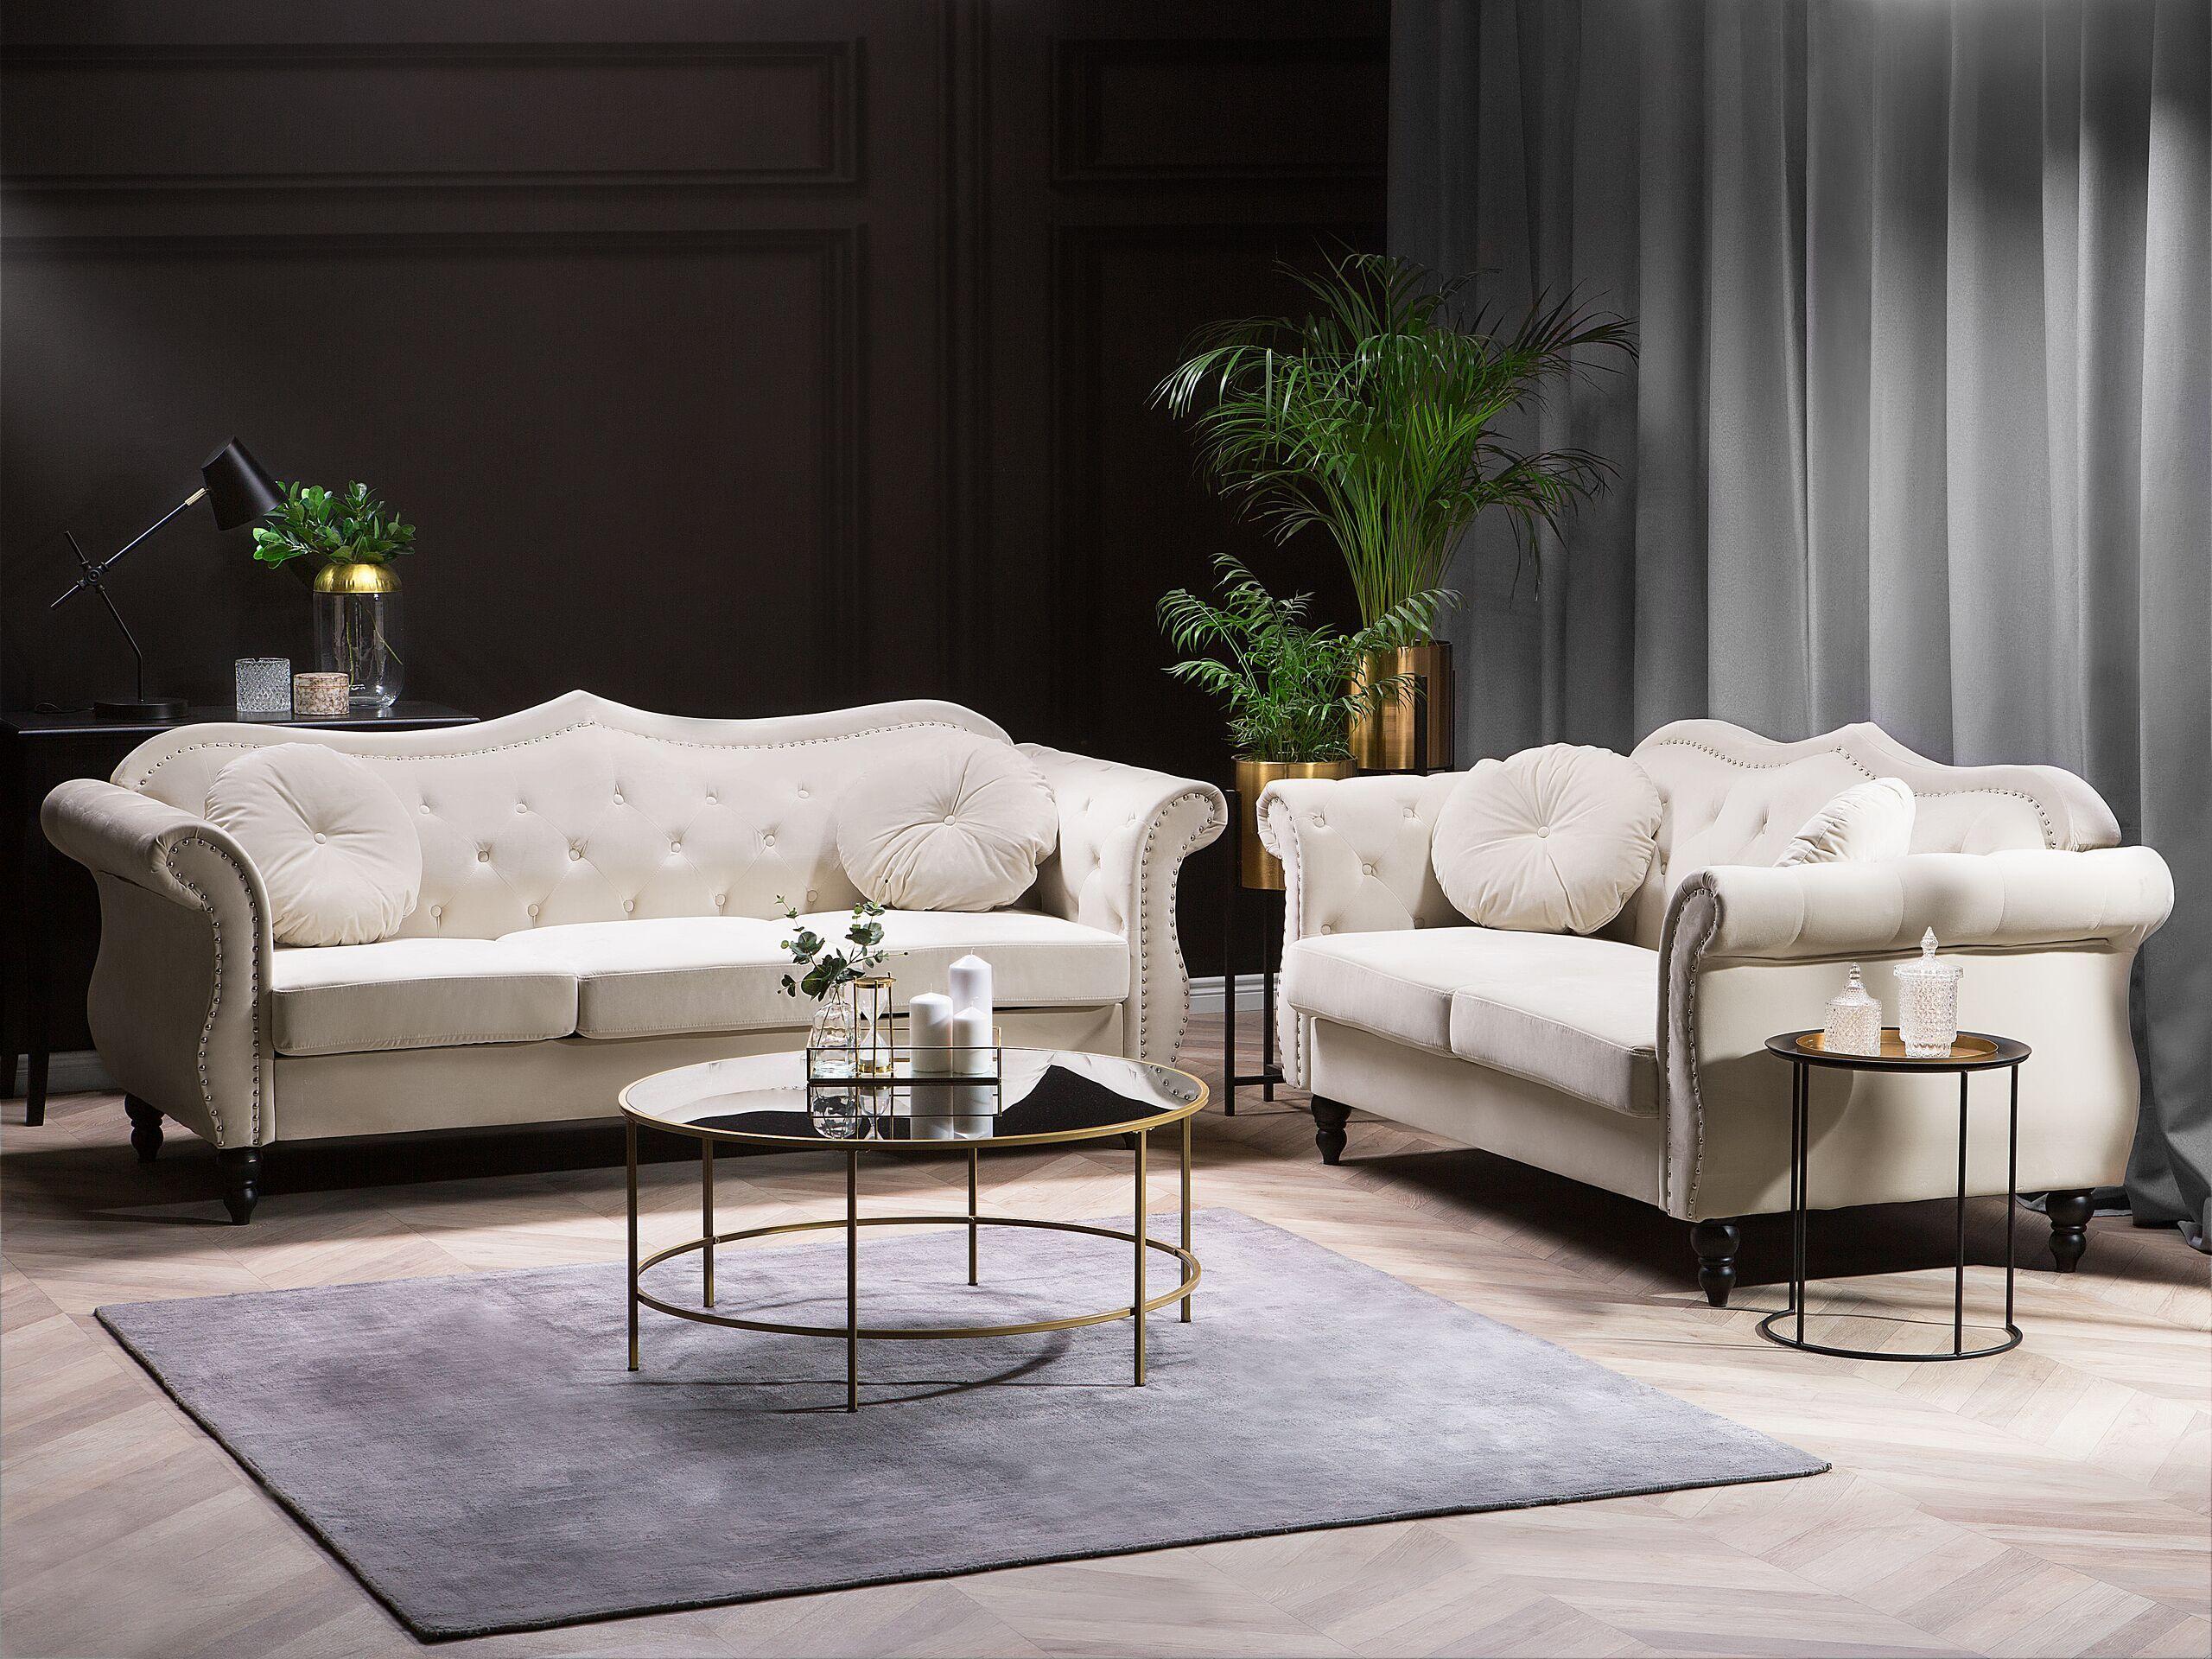 beliani set divani in velluto beige 5 posti